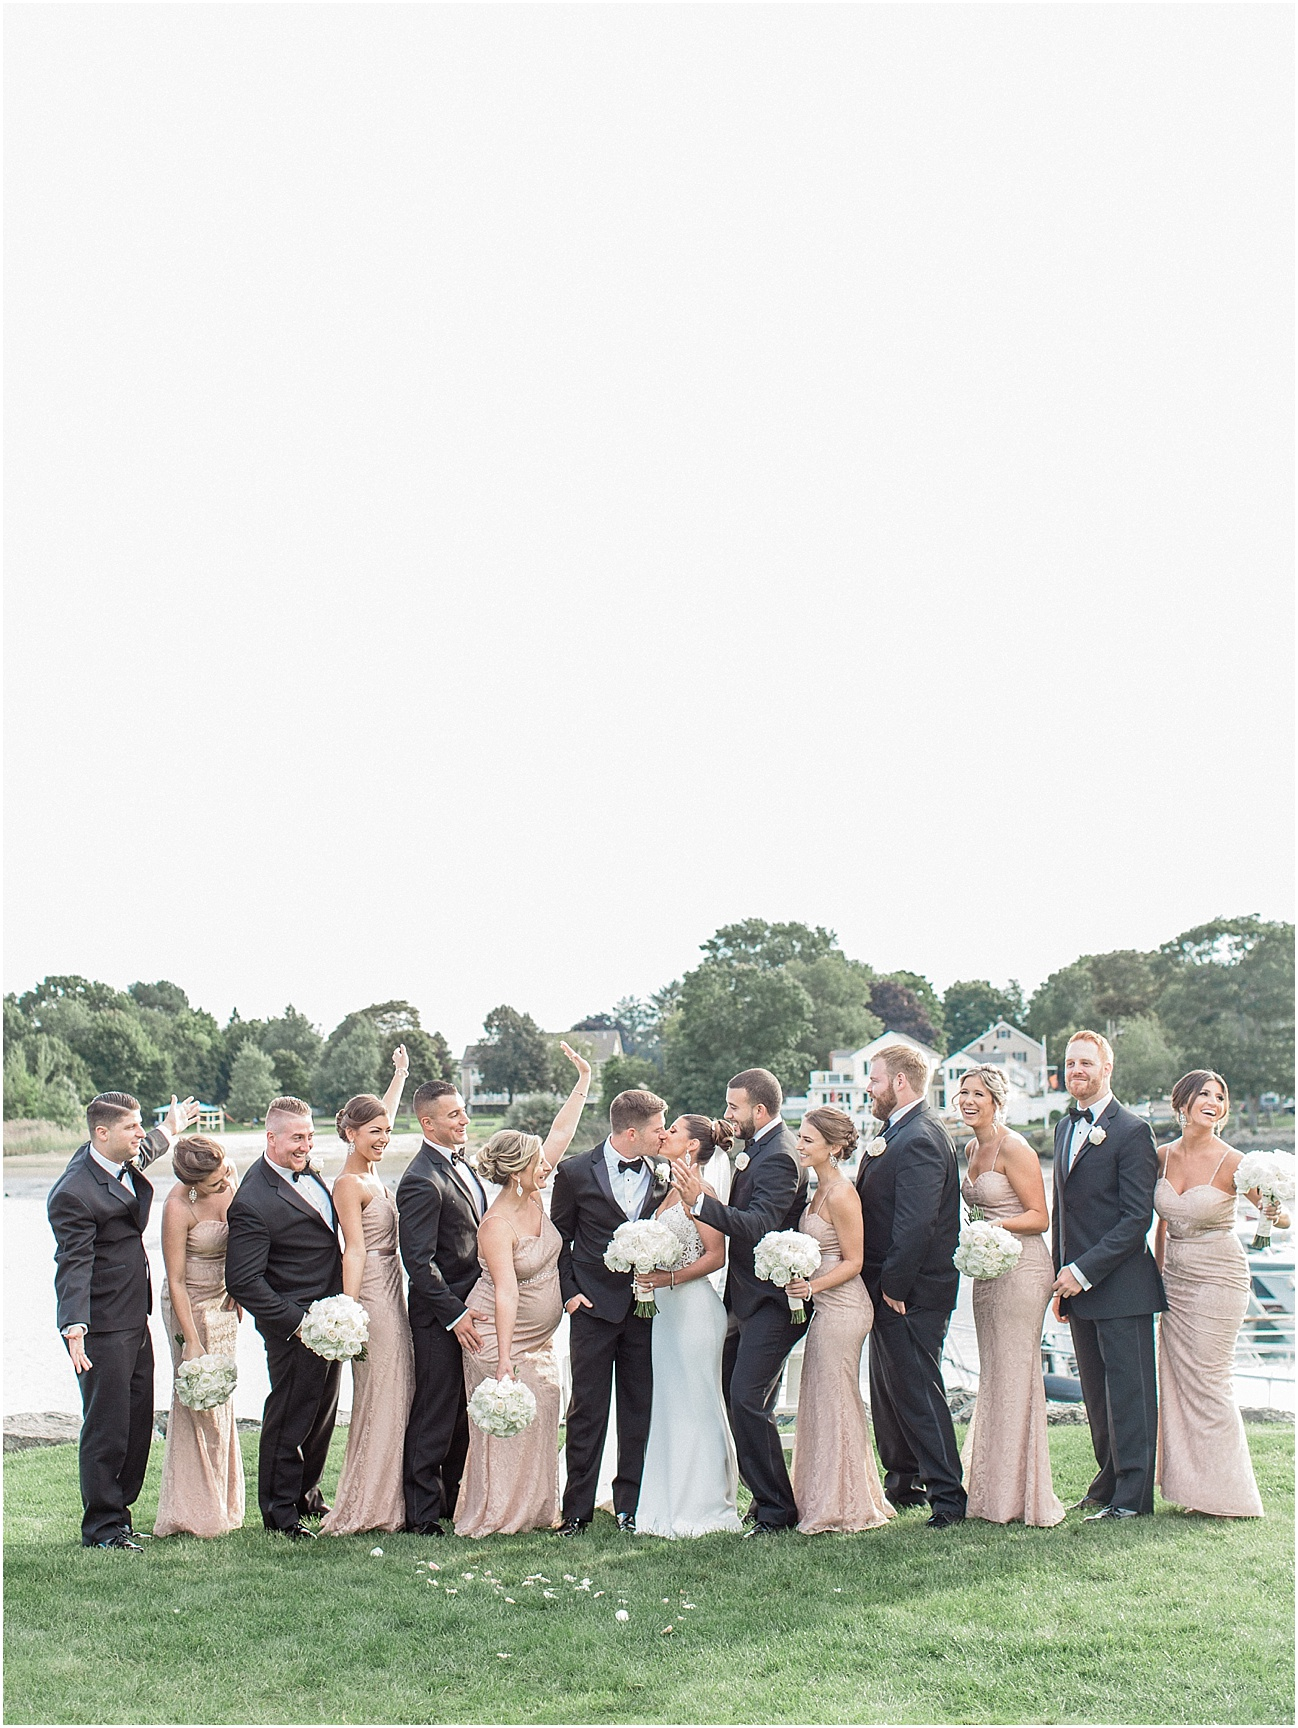 bianca_chris_danversport_italian_blush_gold_north_shore_cape_cod_boston_wedding_photographer_meredith_jane_photography_photo_1127.jpg